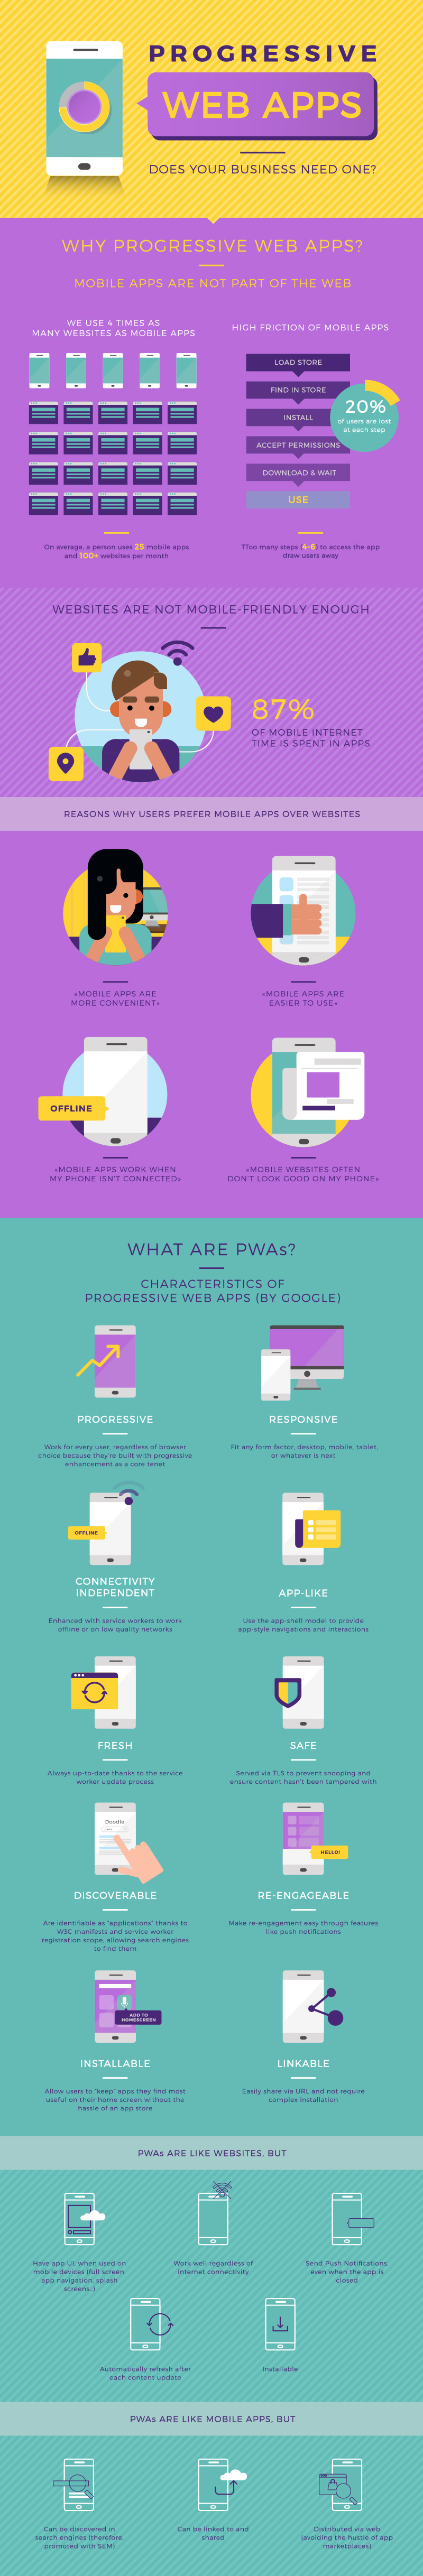 progressive-web-apps-infographic-part-1